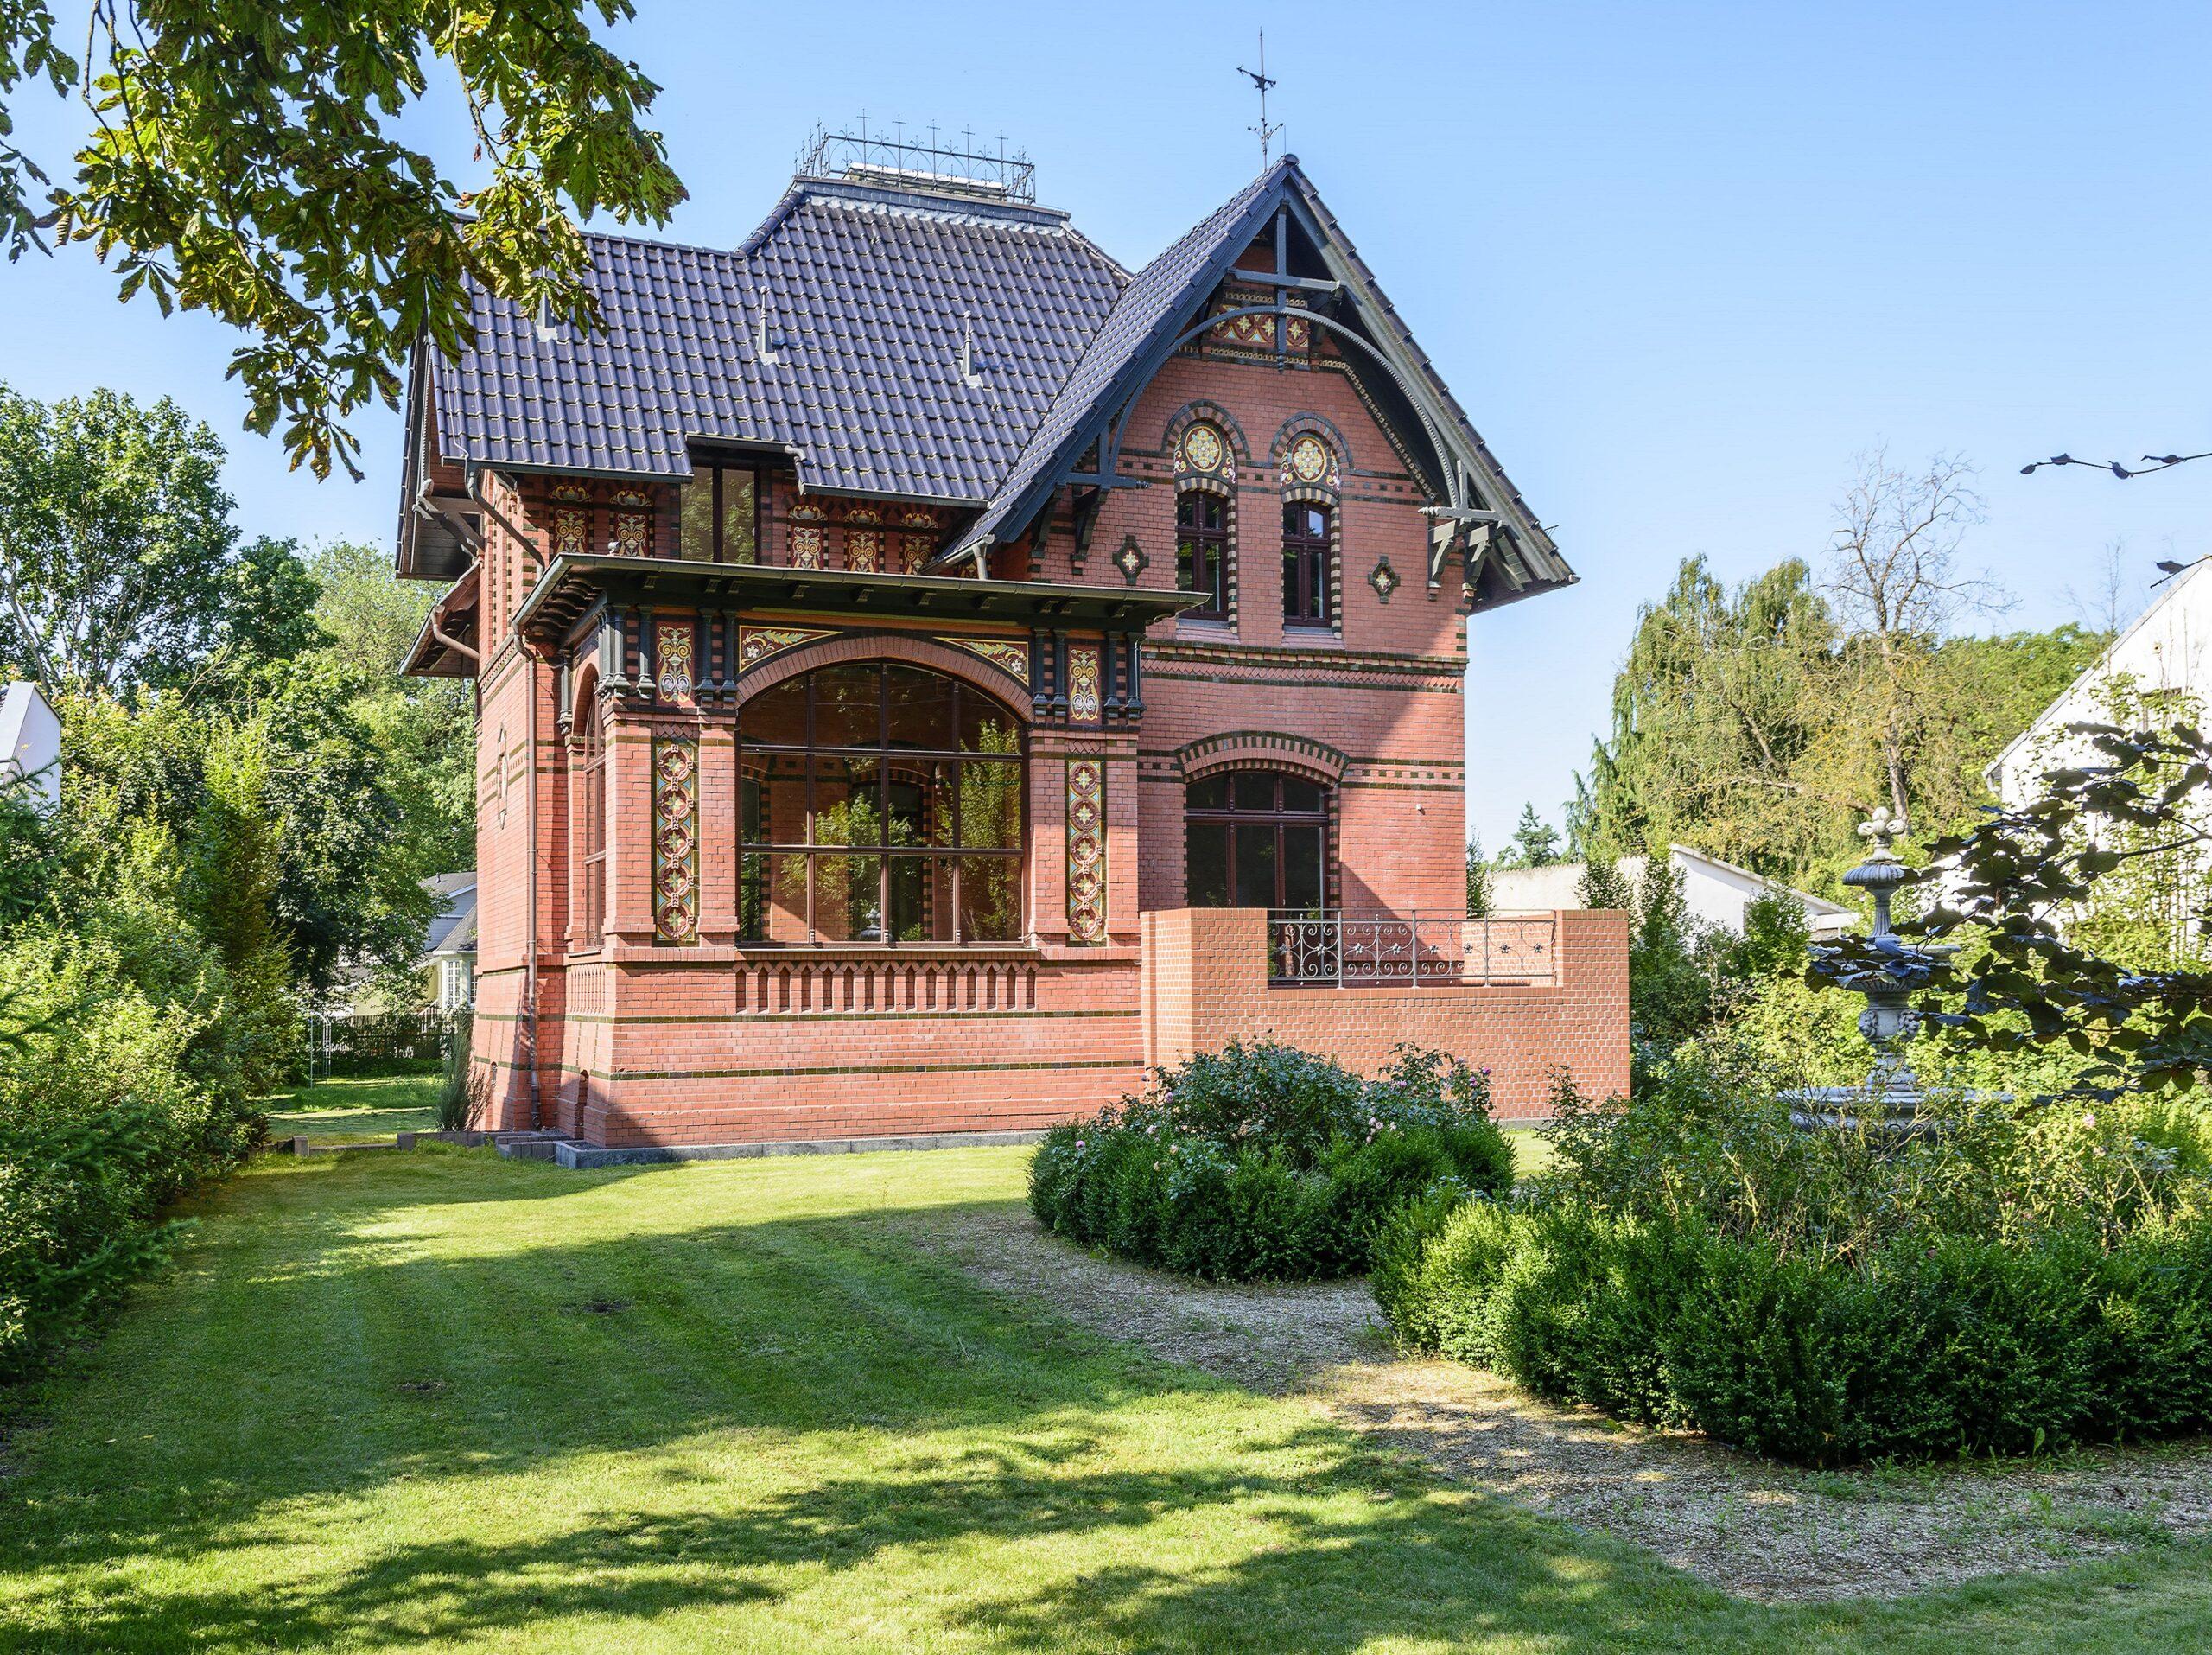 Villa Sommerfeld, bei Berlin – früher exquisiter Jugendstil